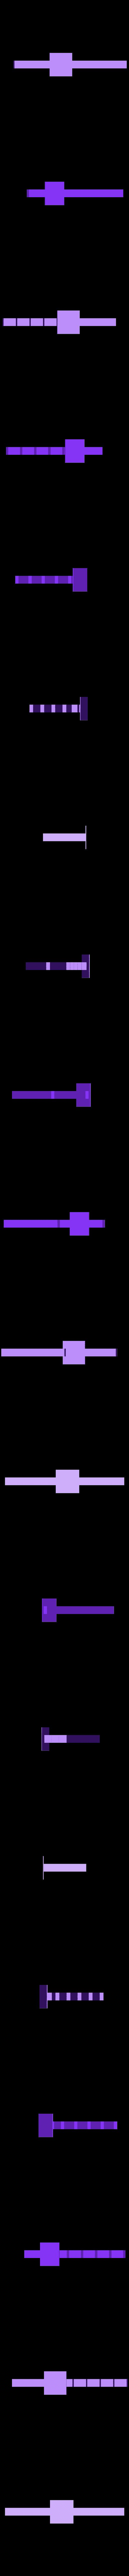 Cantilever_Test_v1-0.stl Download free SCAD file Cantilever Test Print (customizable) • 3D printable template, WalterHsiao